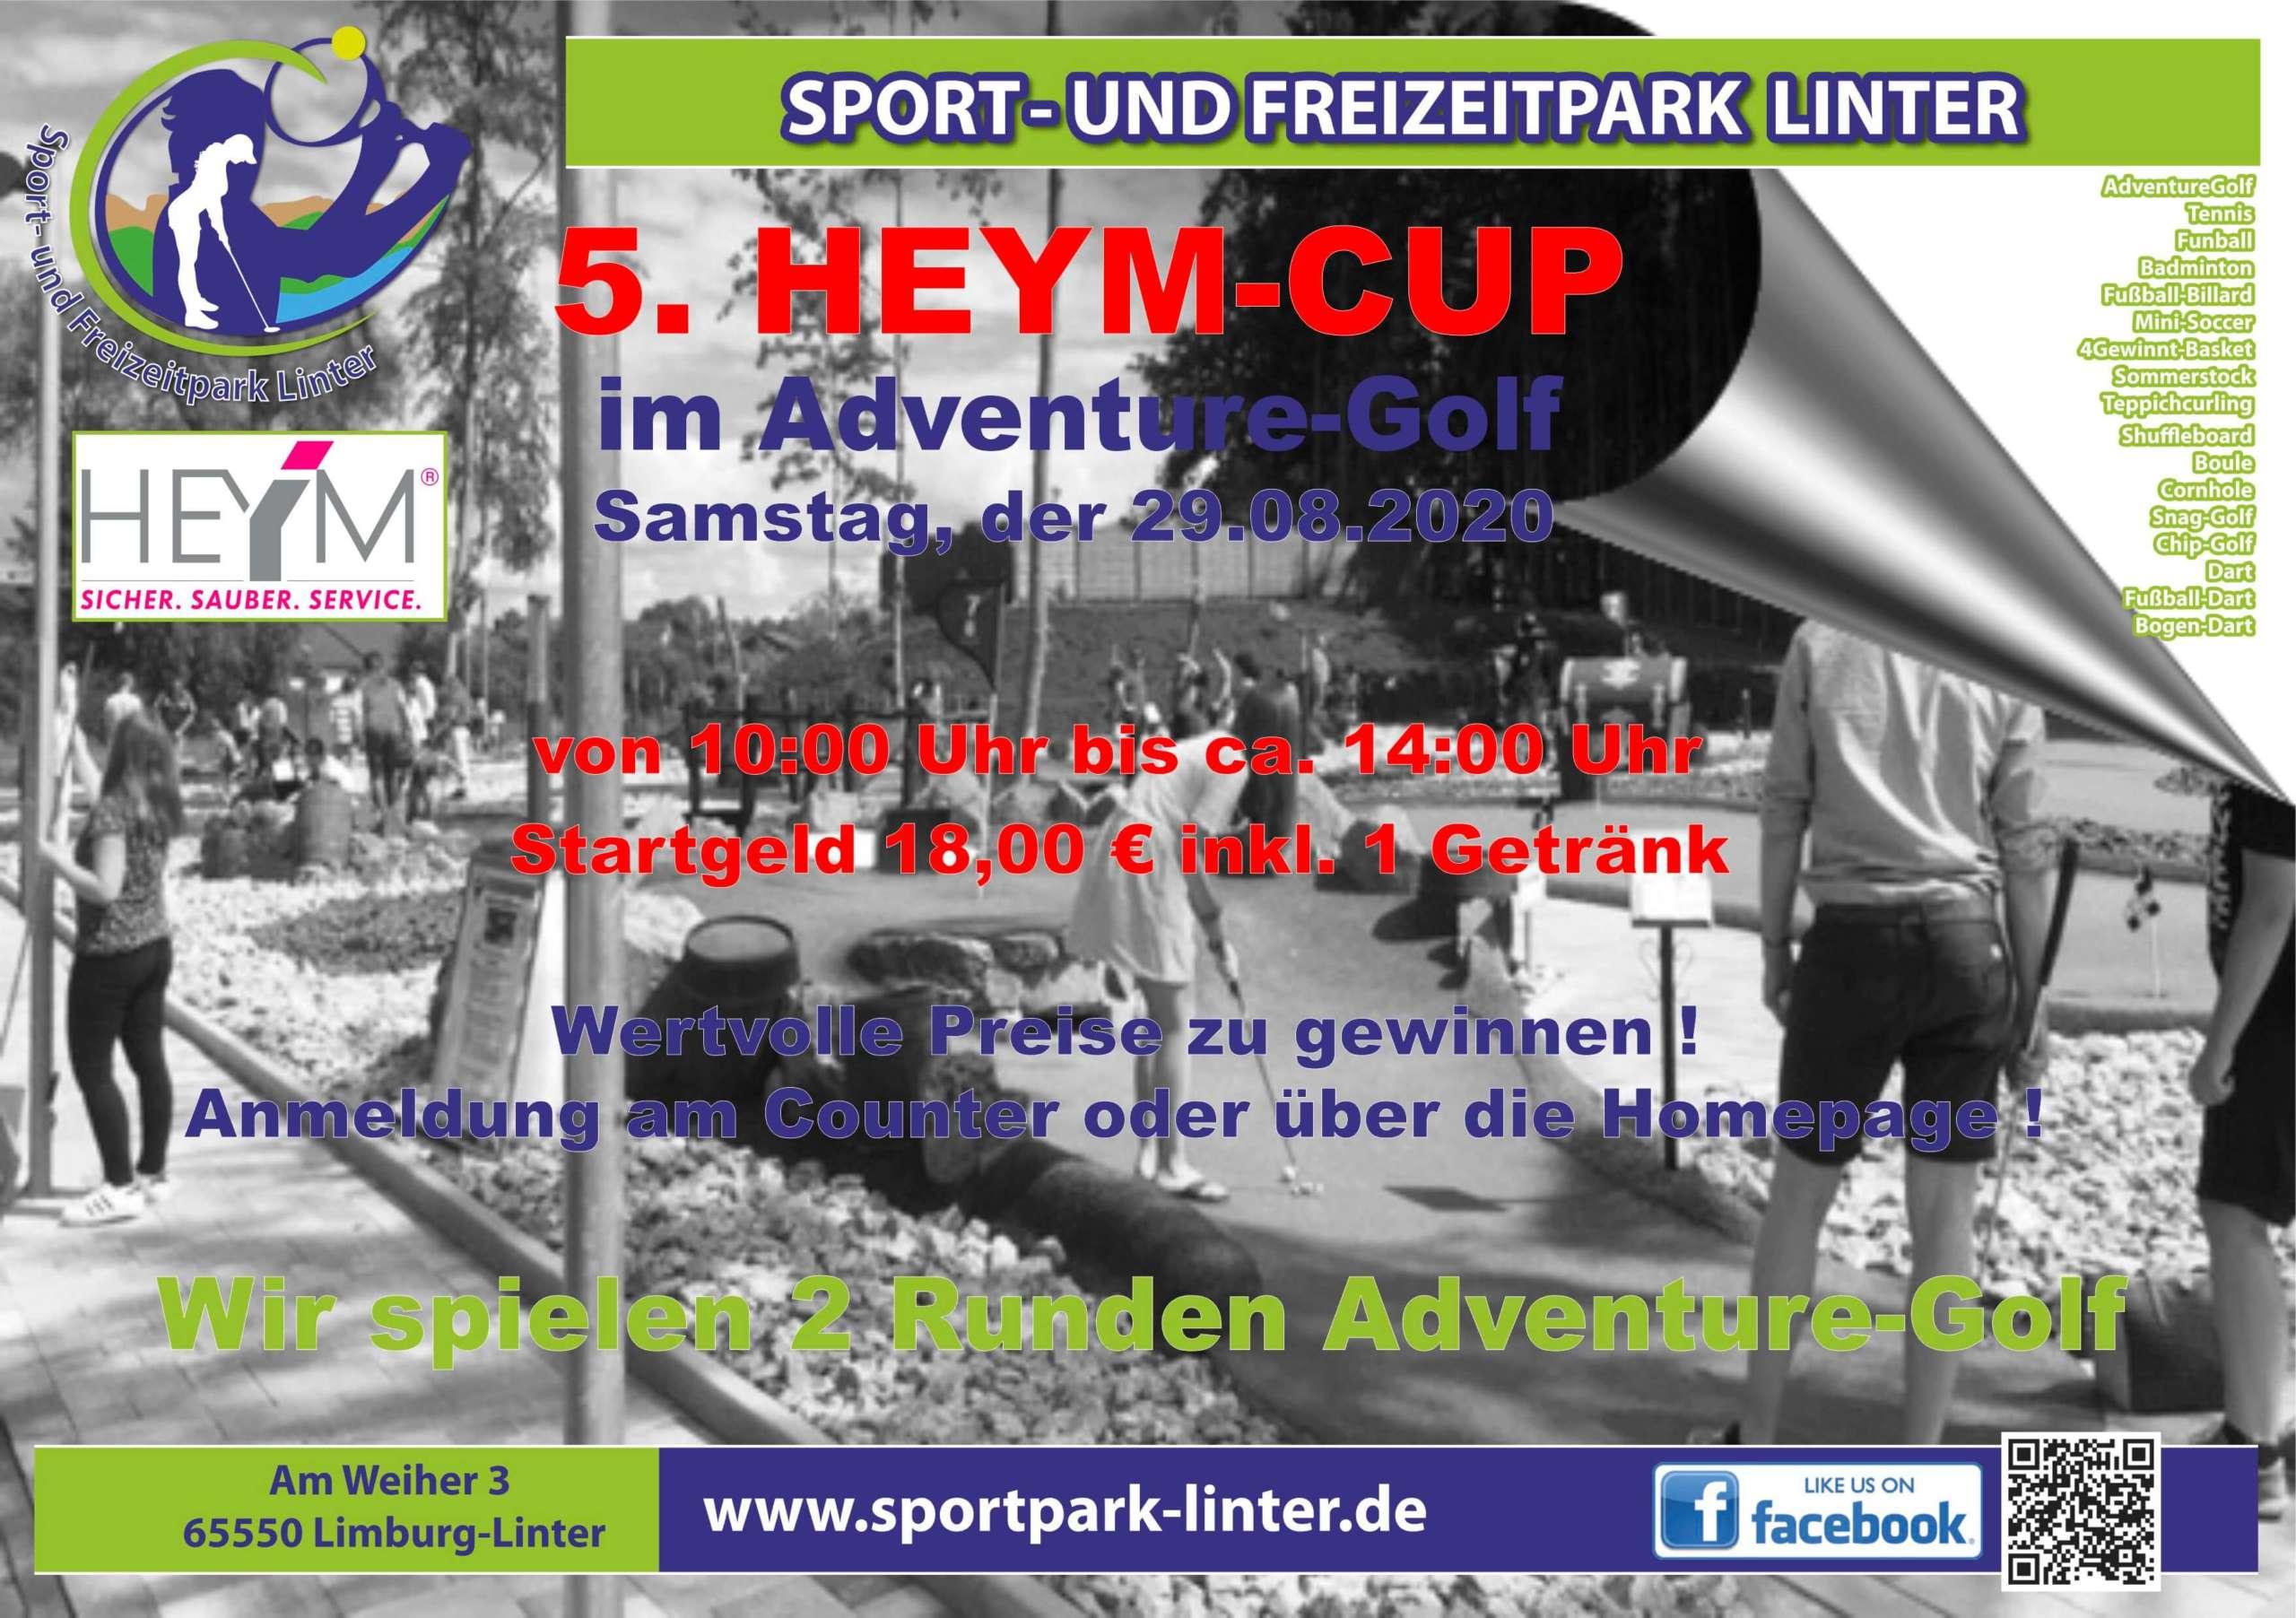 5. HEYM-CUP 2020